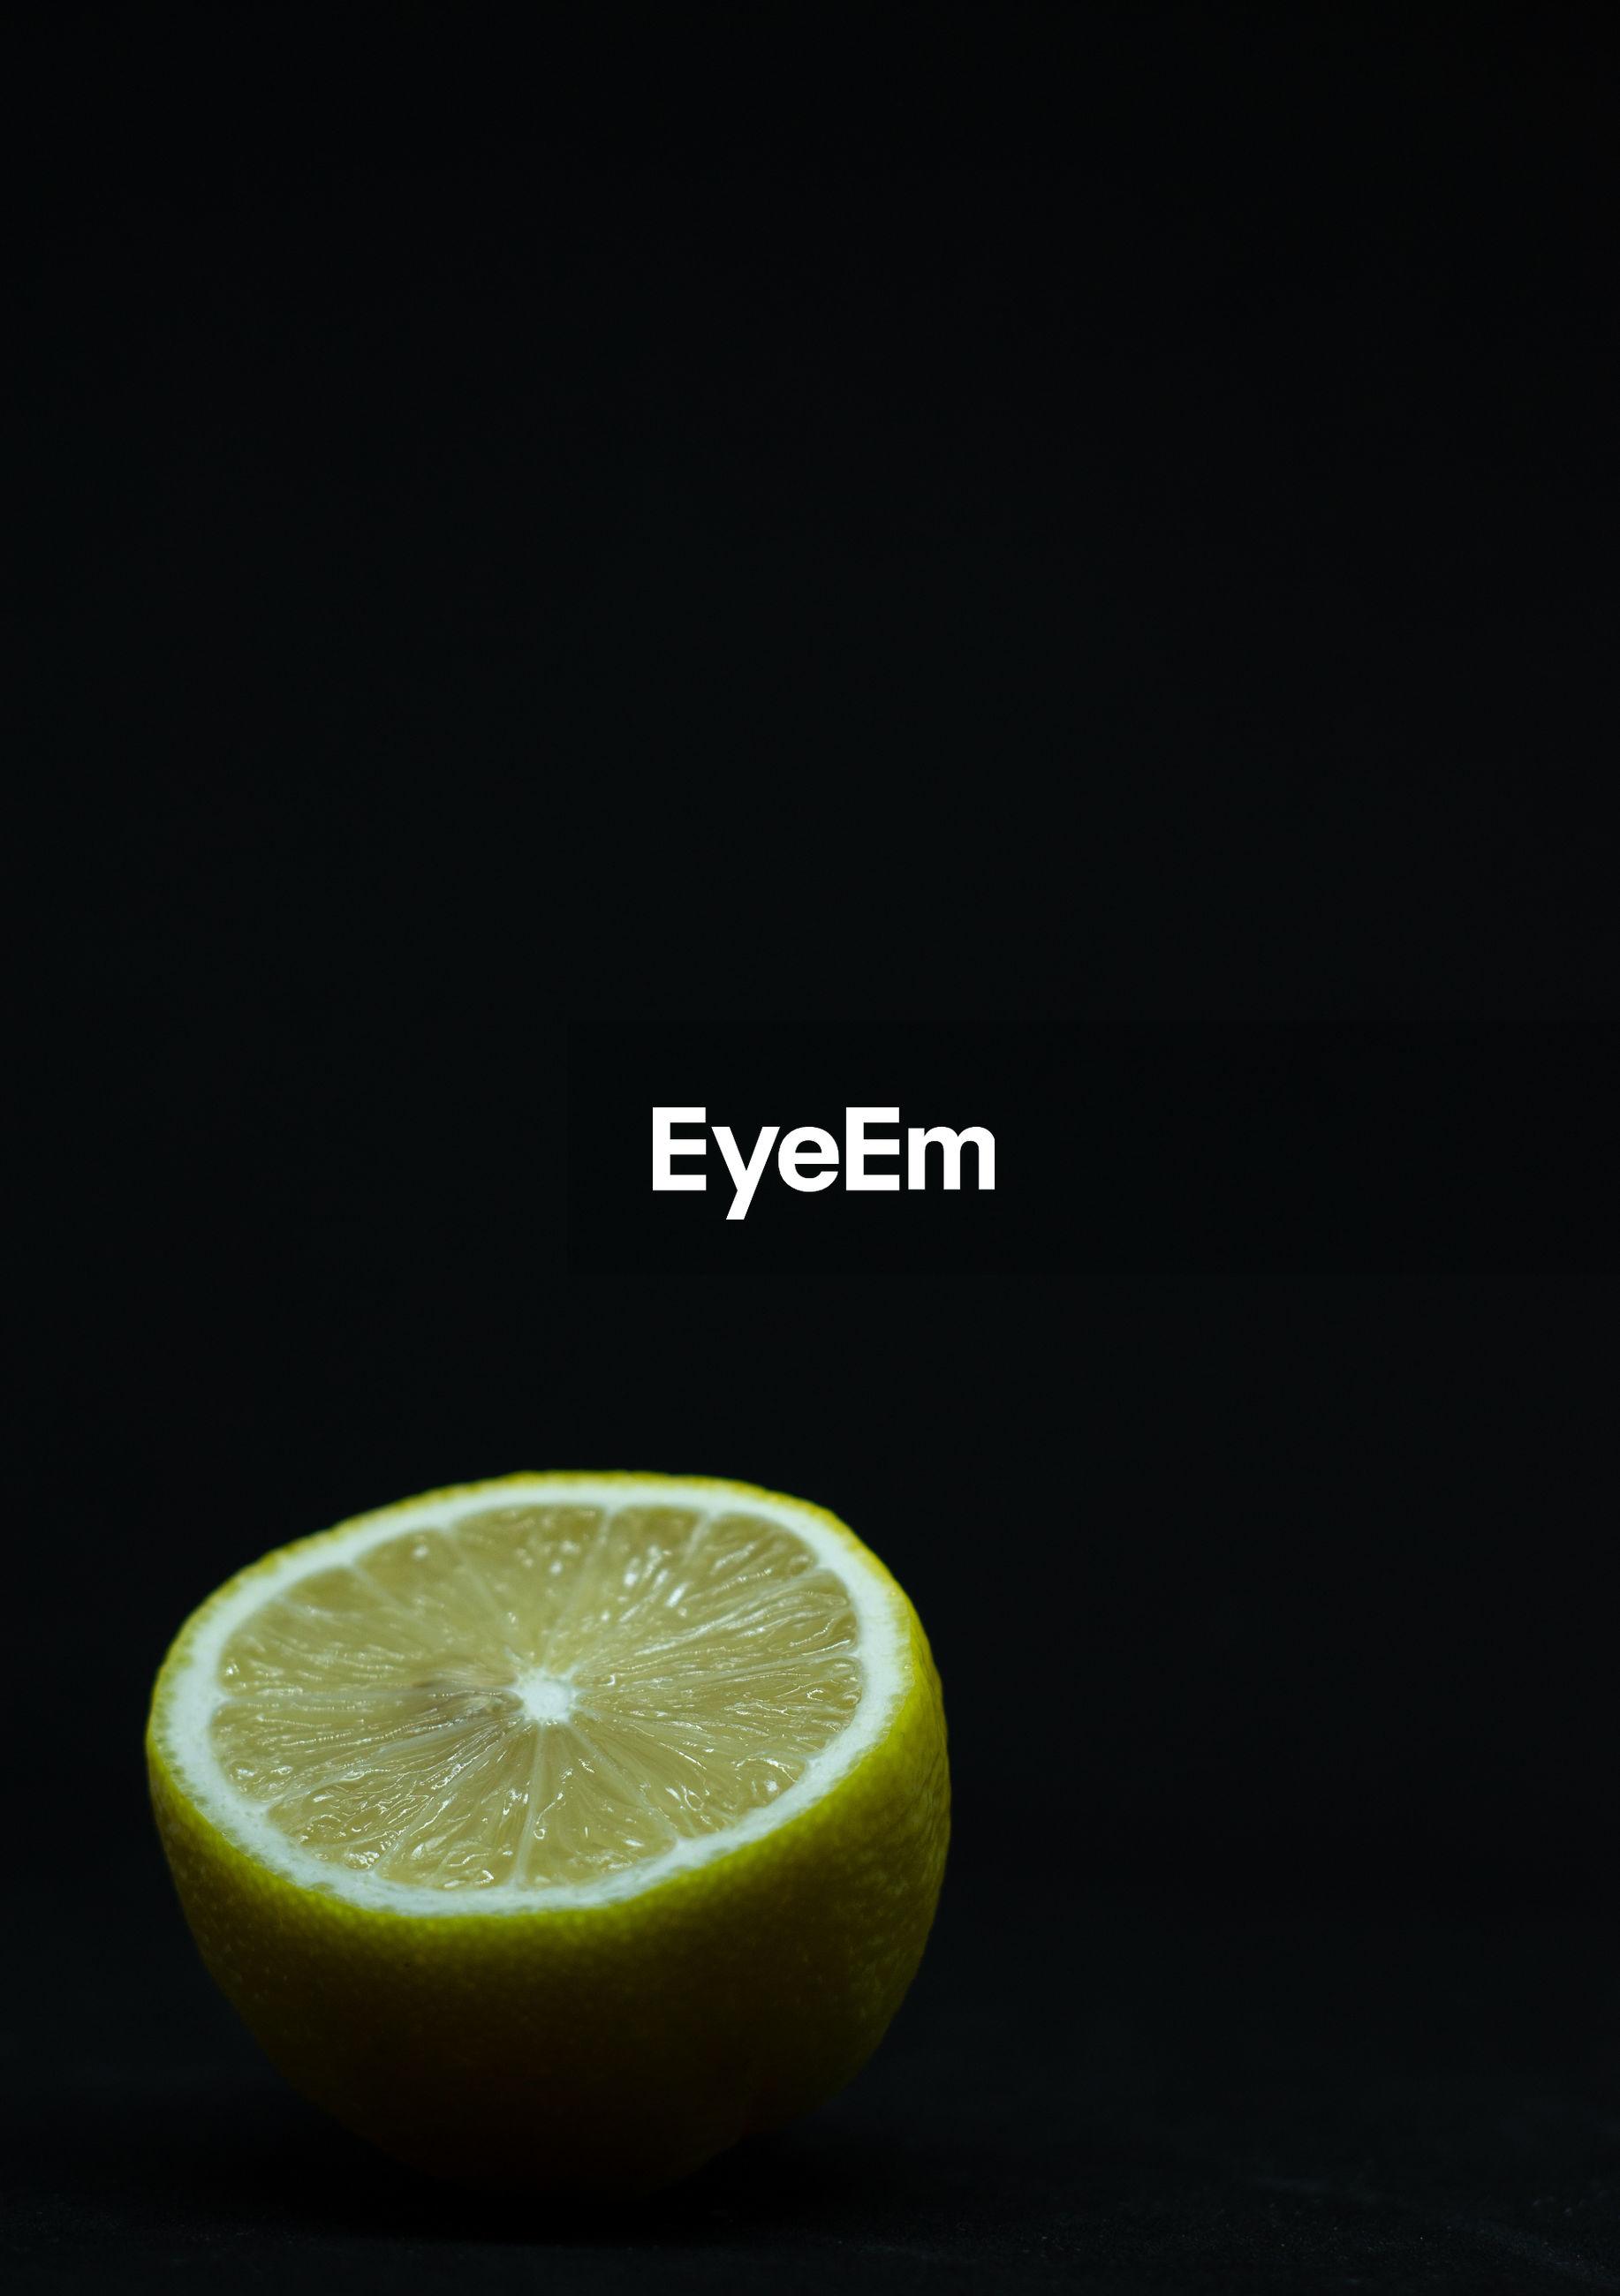 Close-up of lemon slice on table against black background